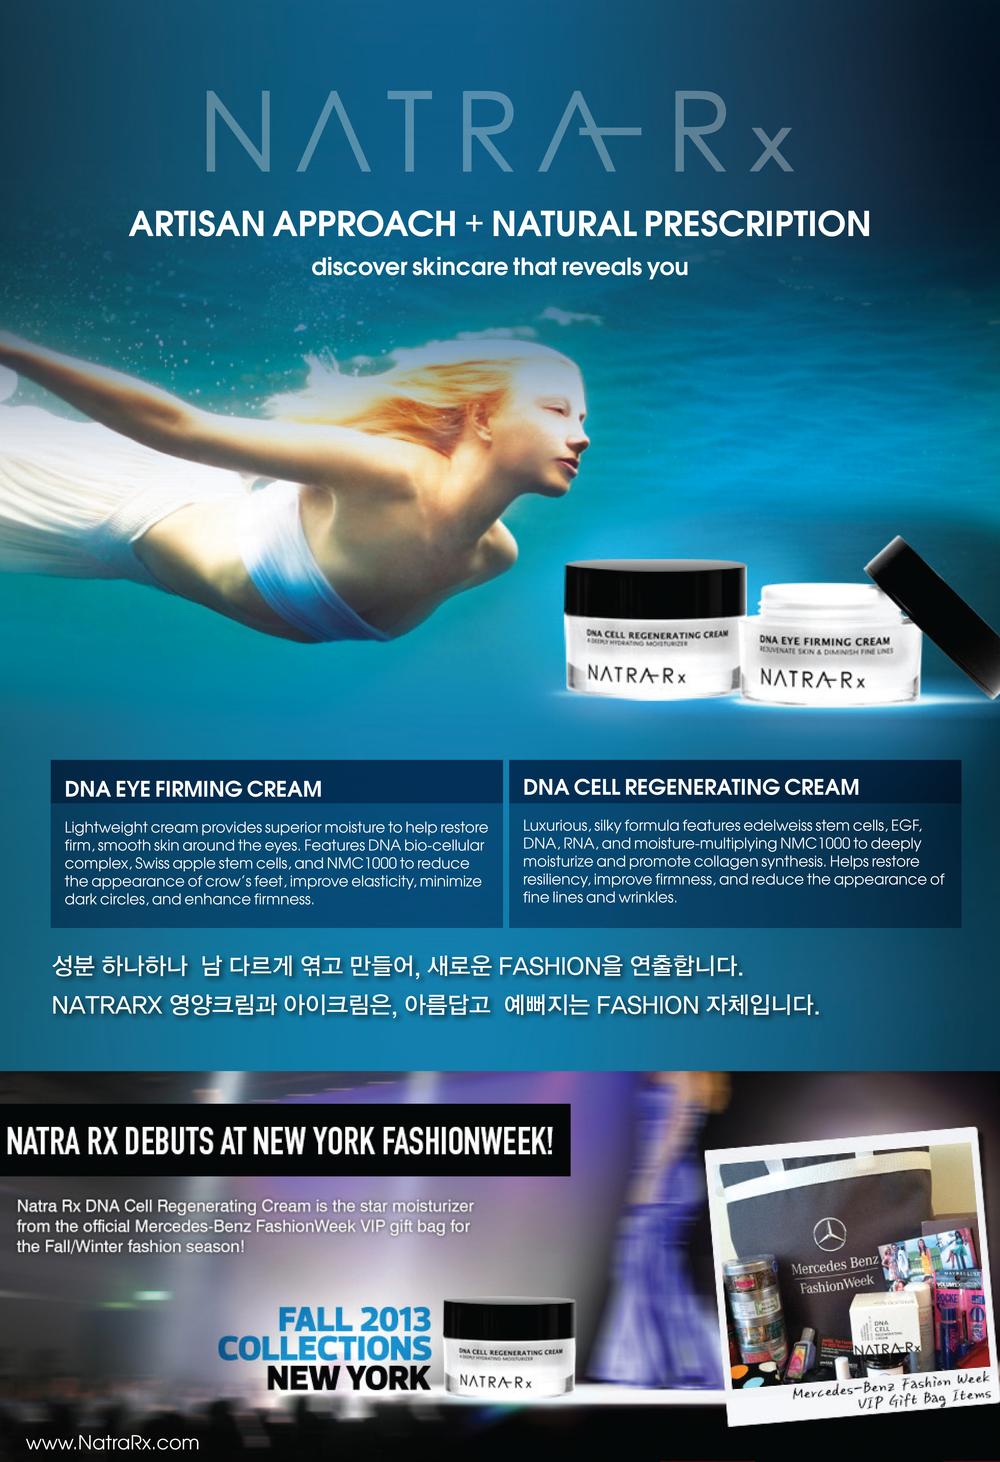 NataRx-poster-C_final.jpg